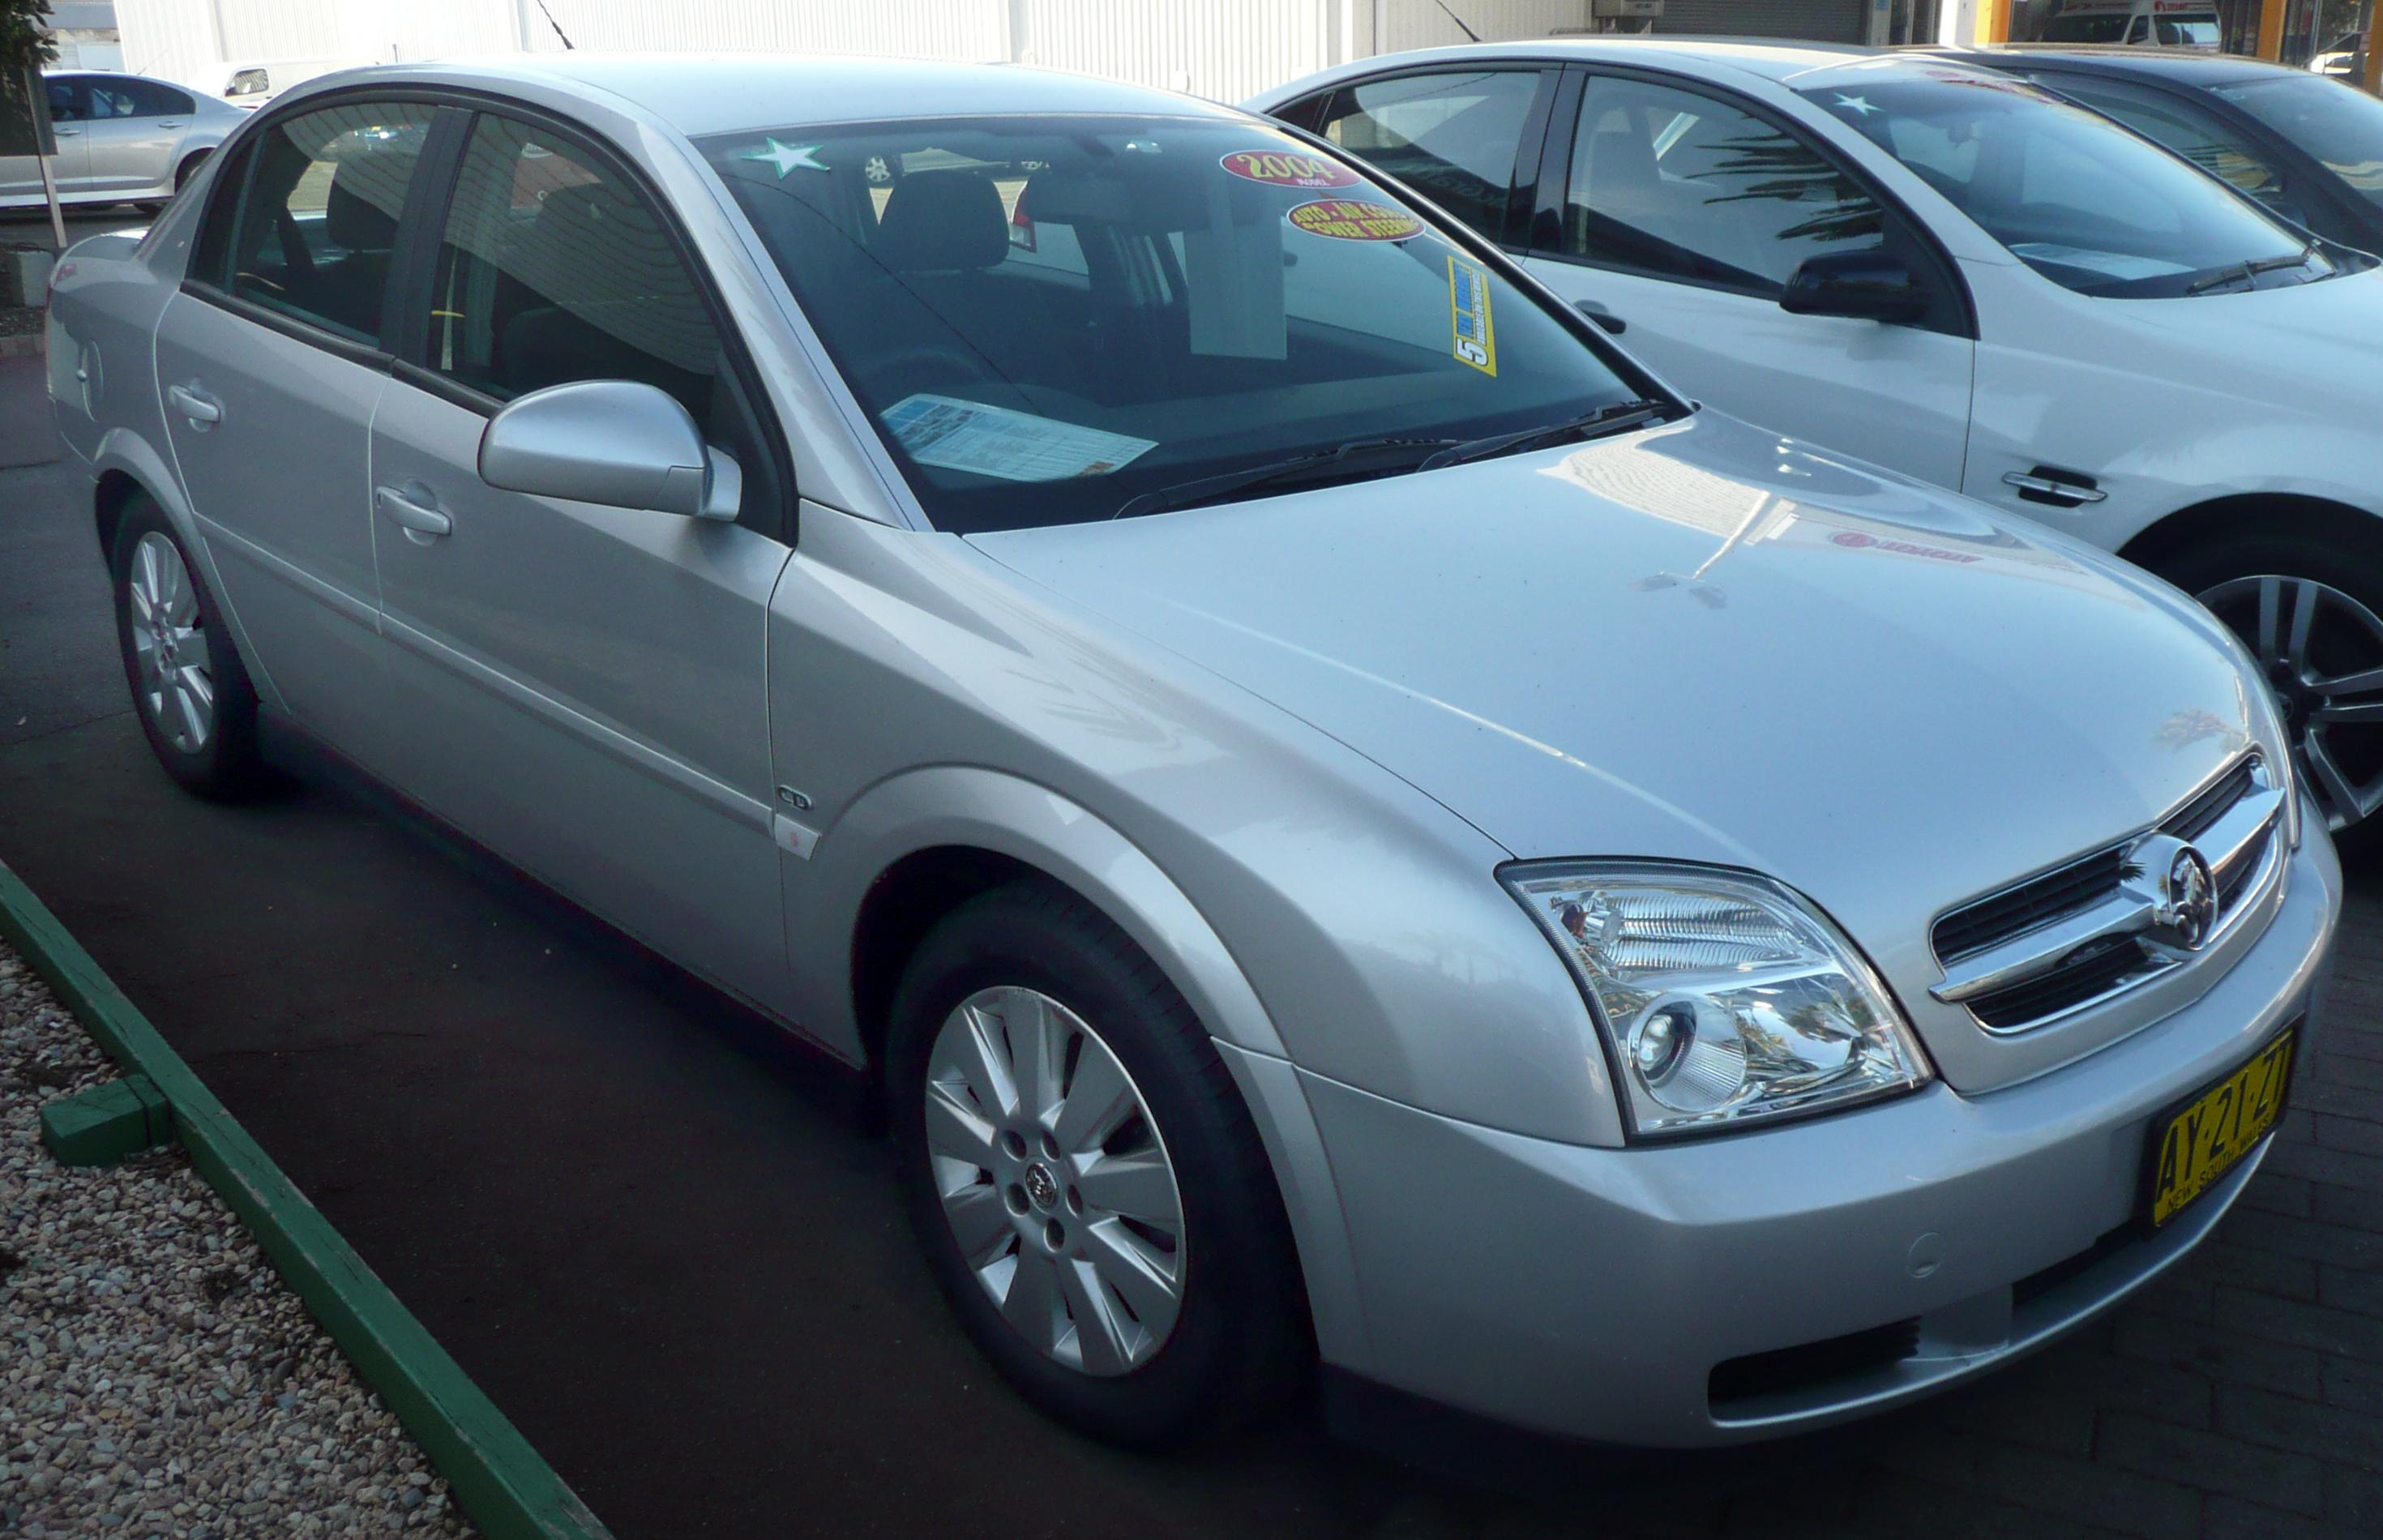 File:2004 Holden Vectra (ZC MY04) CD sedan (2008-12-